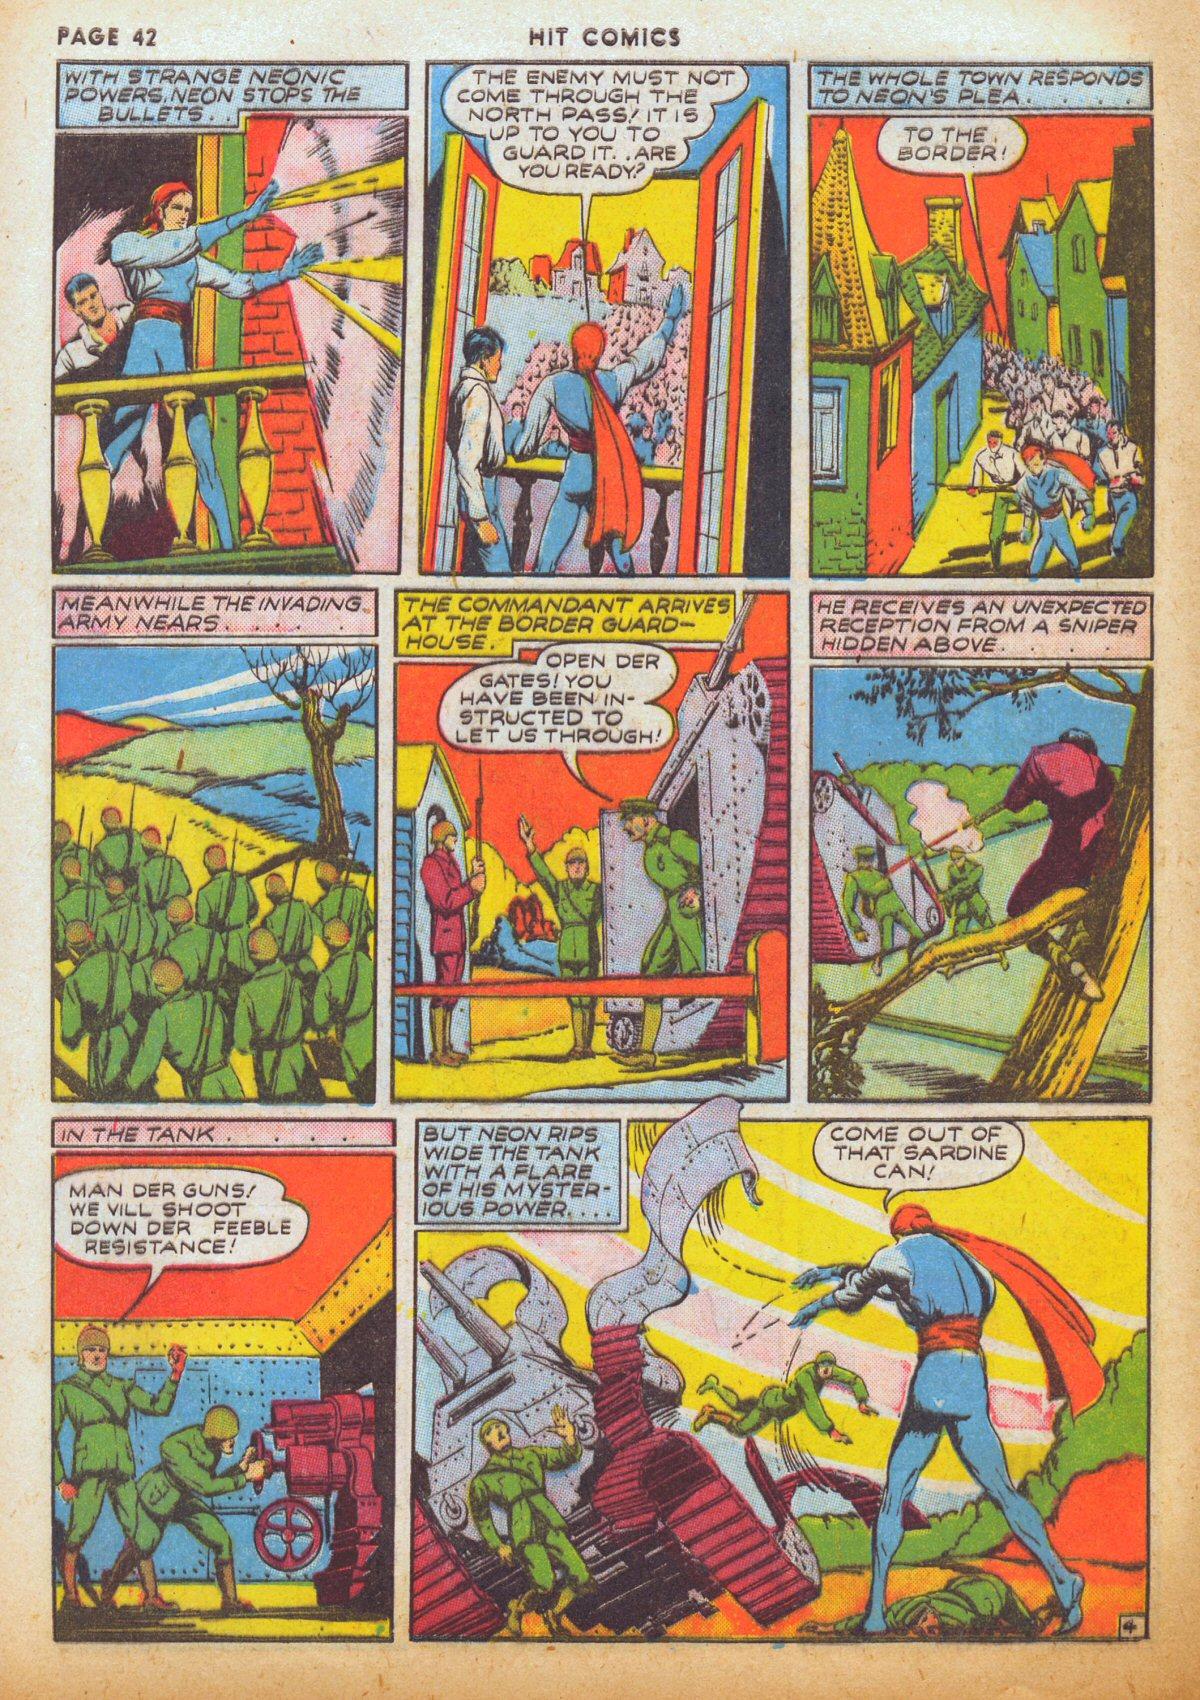 Read online Hit Comics comic -  Issue #12 - 44